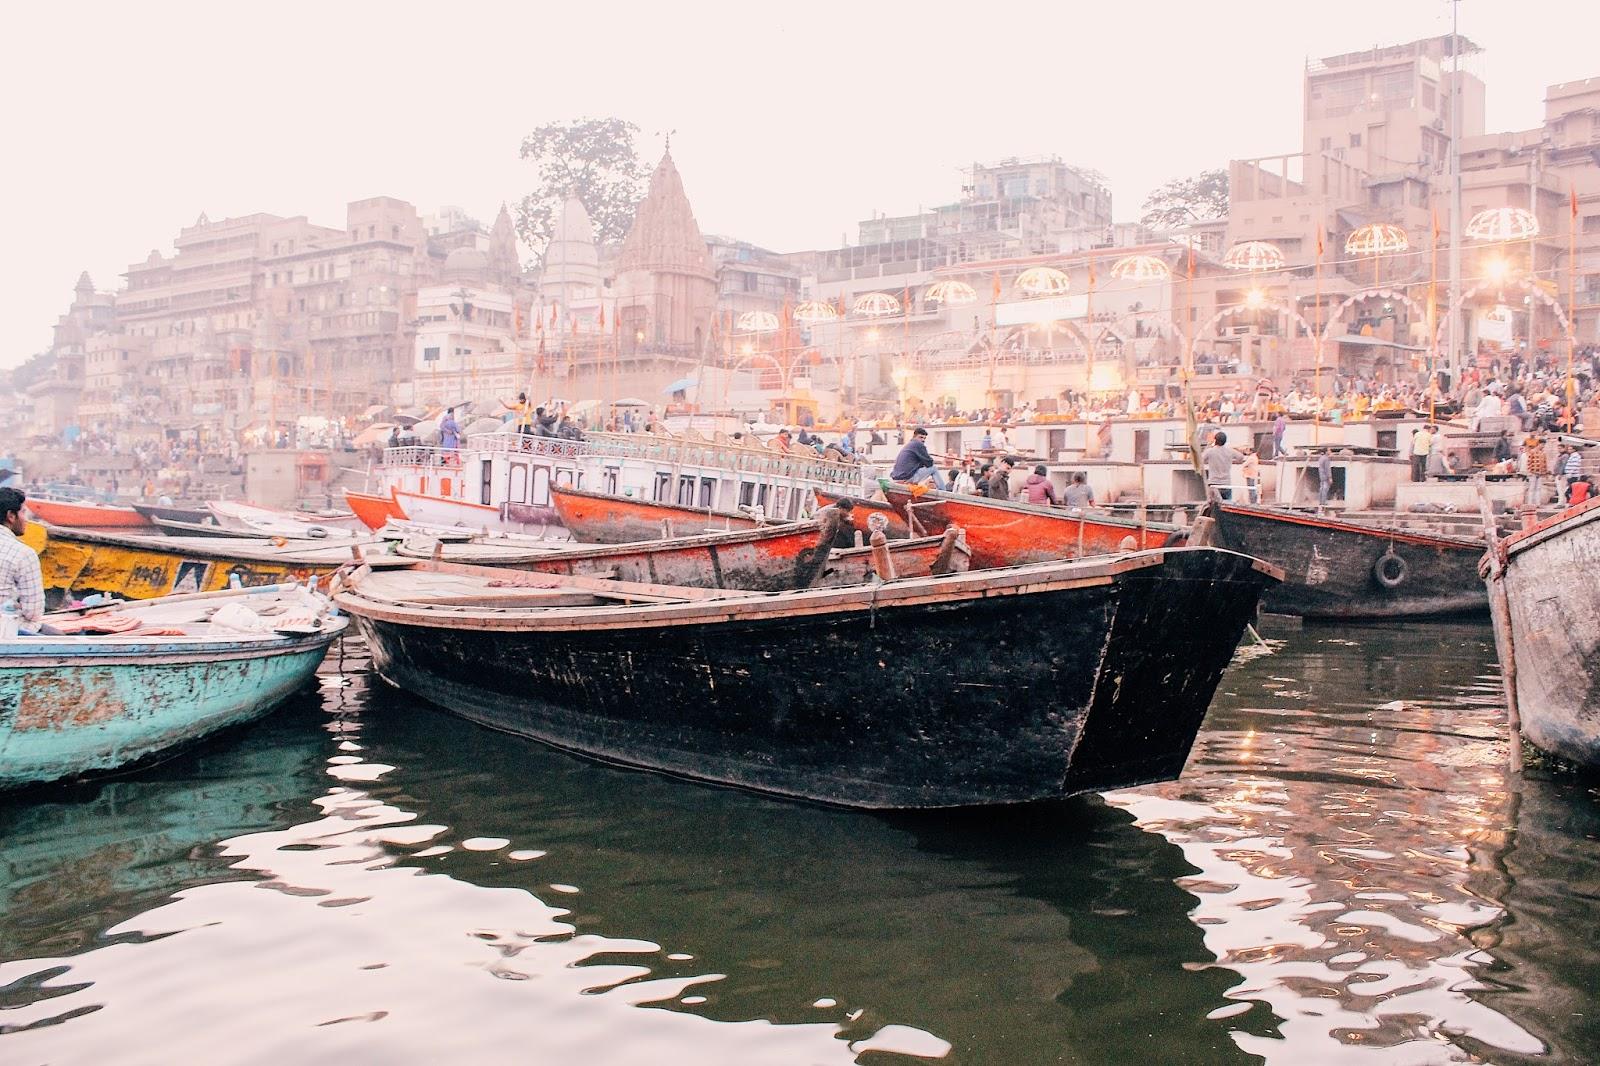 varanasi travel guide, vranasai information, tips on varanasi, travel varanasi, spiritual capital of india, city of temples, indian travel blogger, uk blog, benares travel